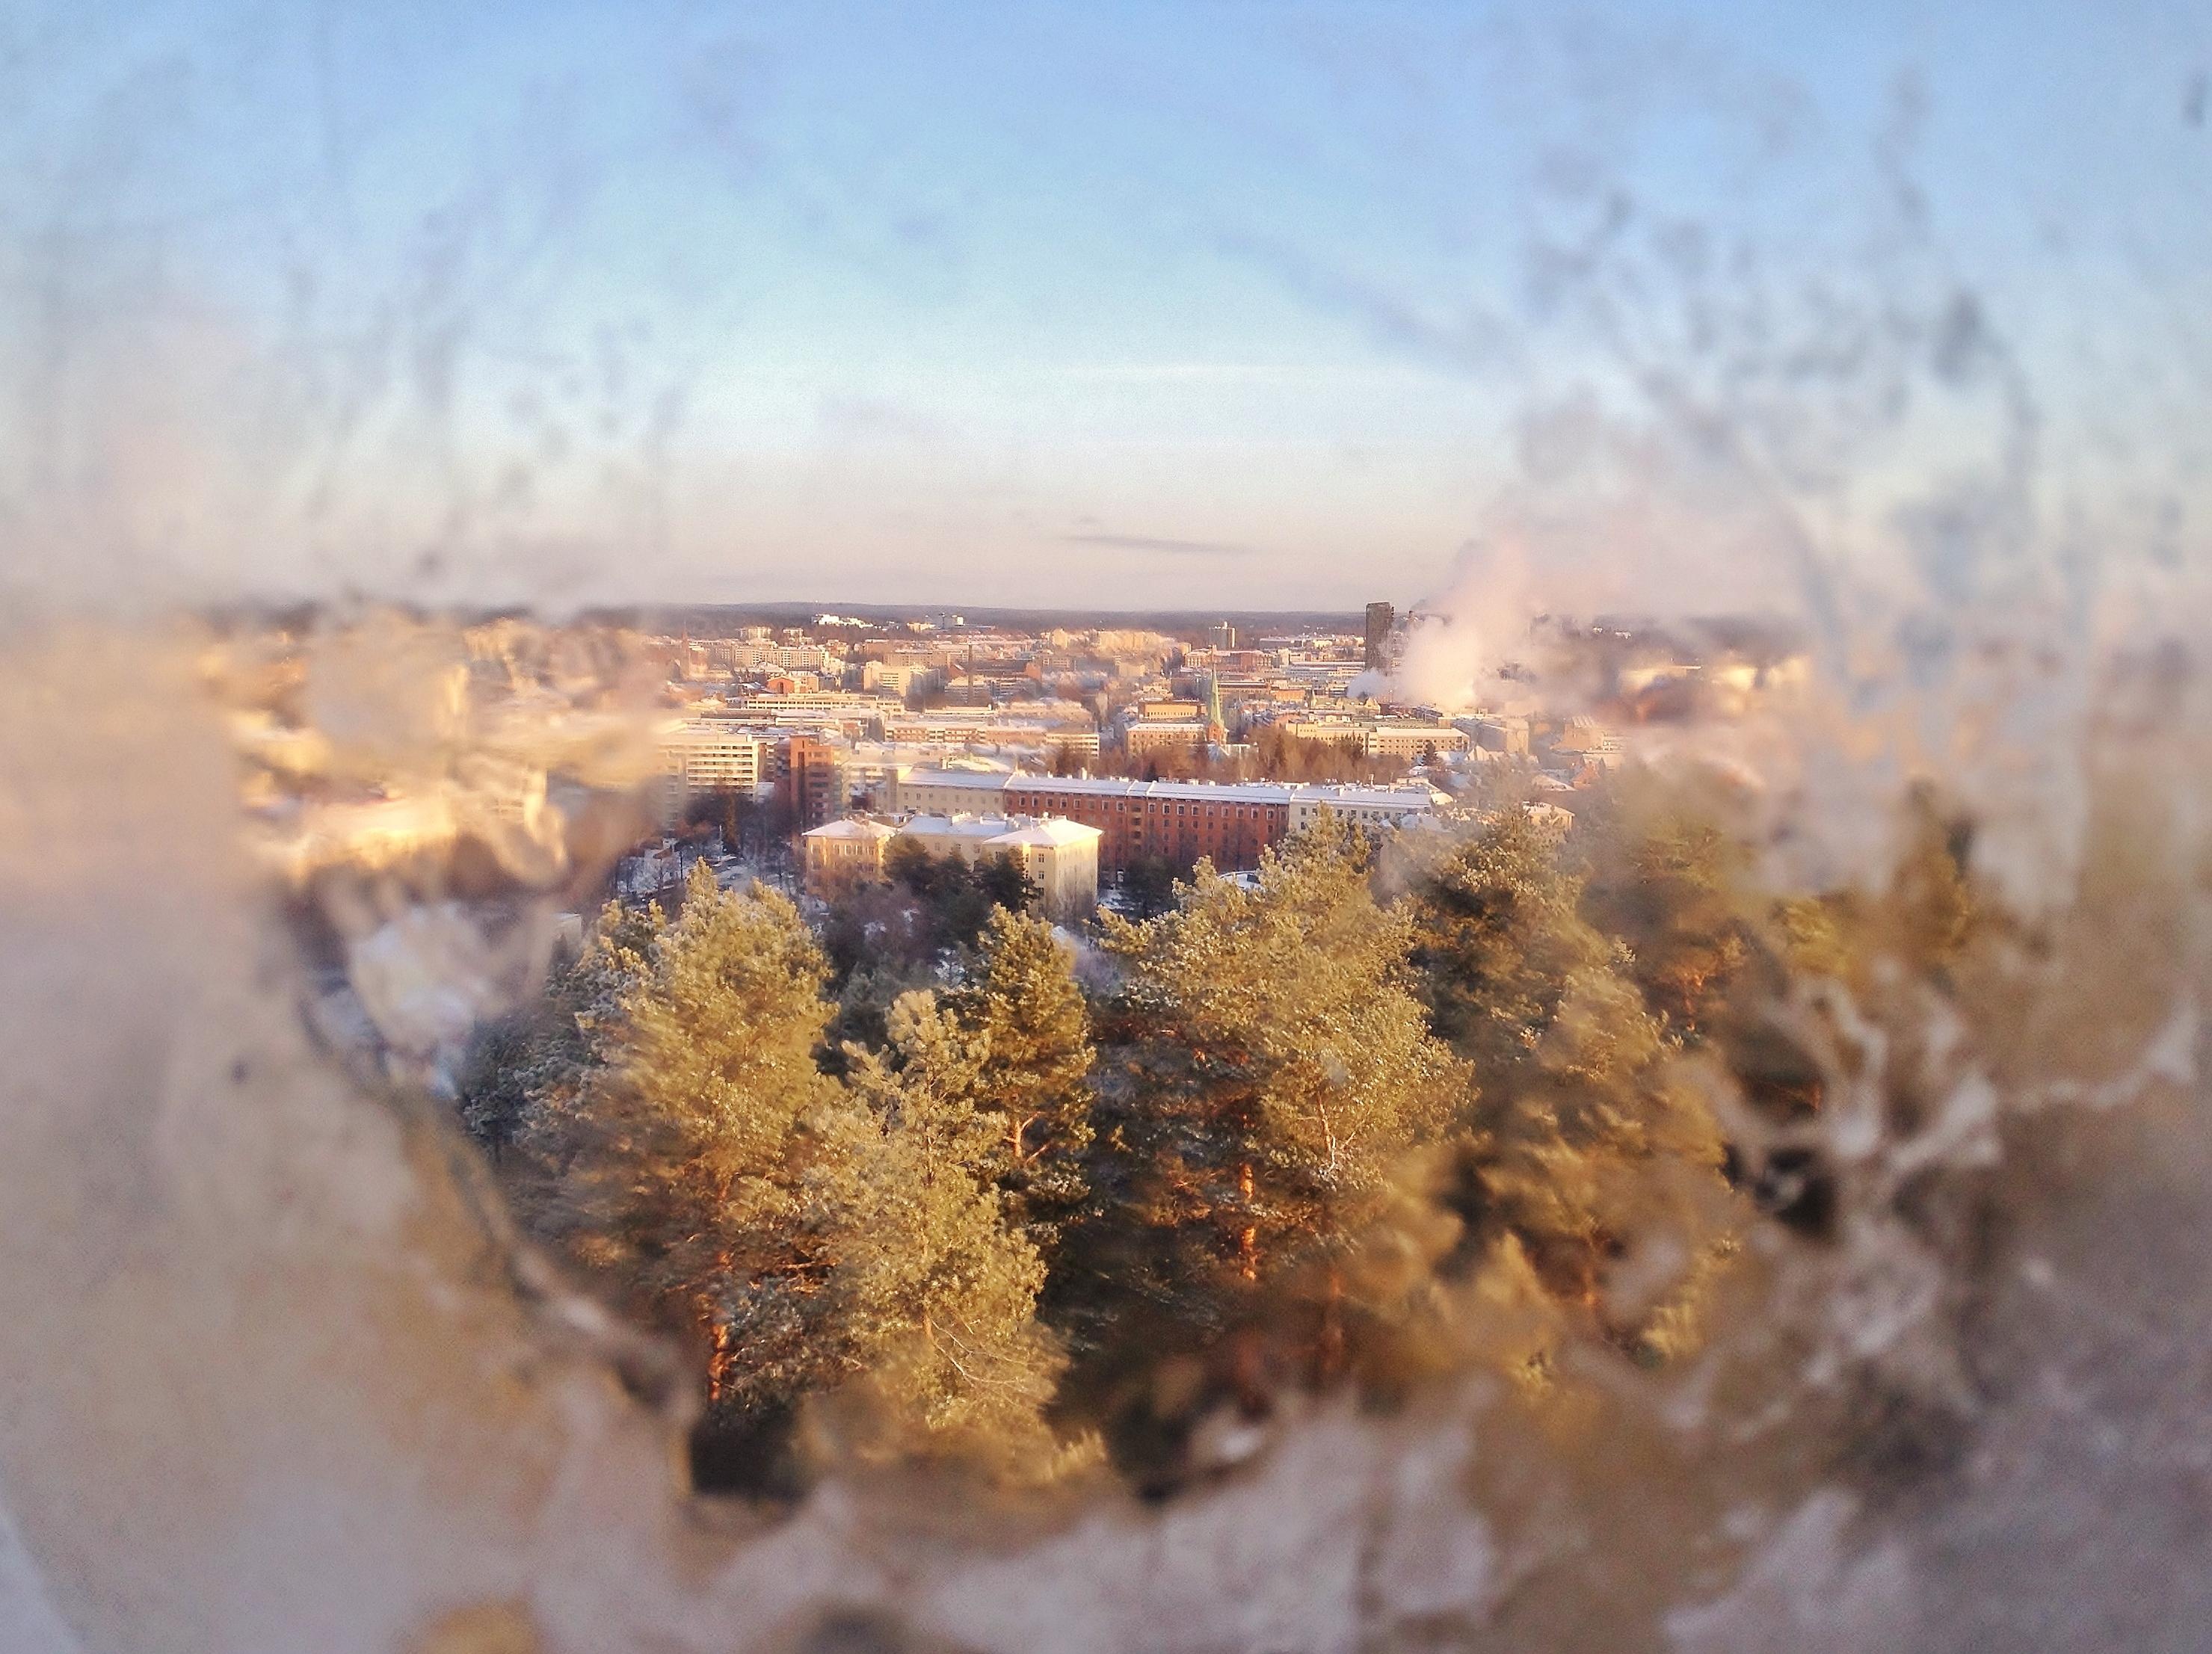 Pyynikki observation tower on 5th January 2016 1.jpg